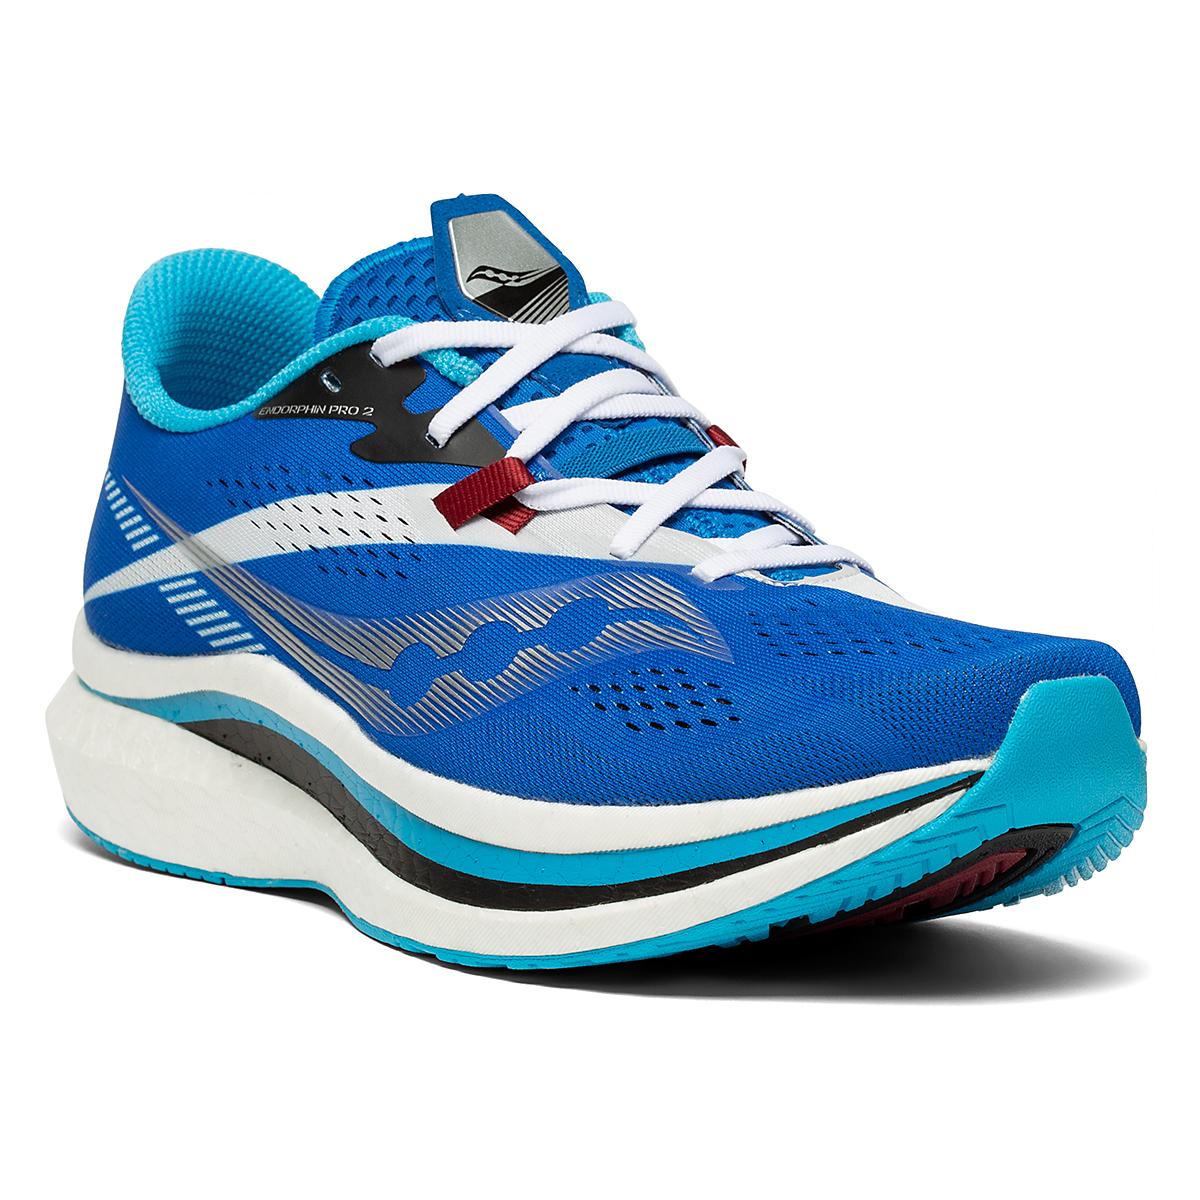 Men's Saucony Endorphin Pro 2 Running Shoe - Color: Royal/White - Size: 7 - Width: Regular, Royal/White, large, image 5